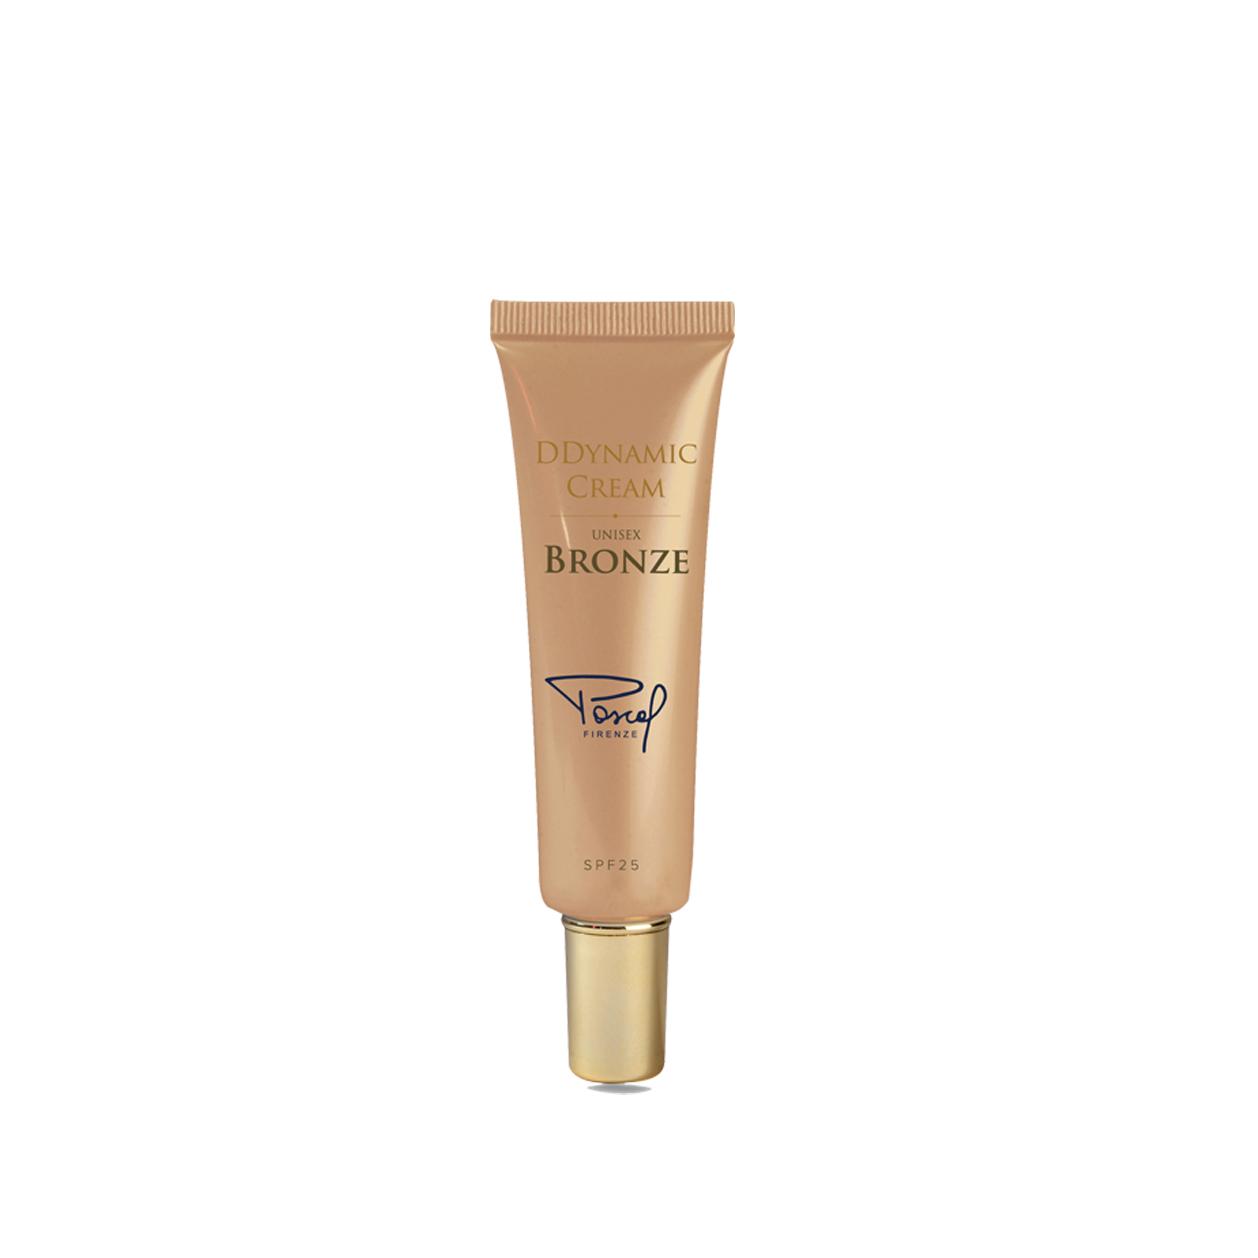 DDynamic Cream Bronze Unisex